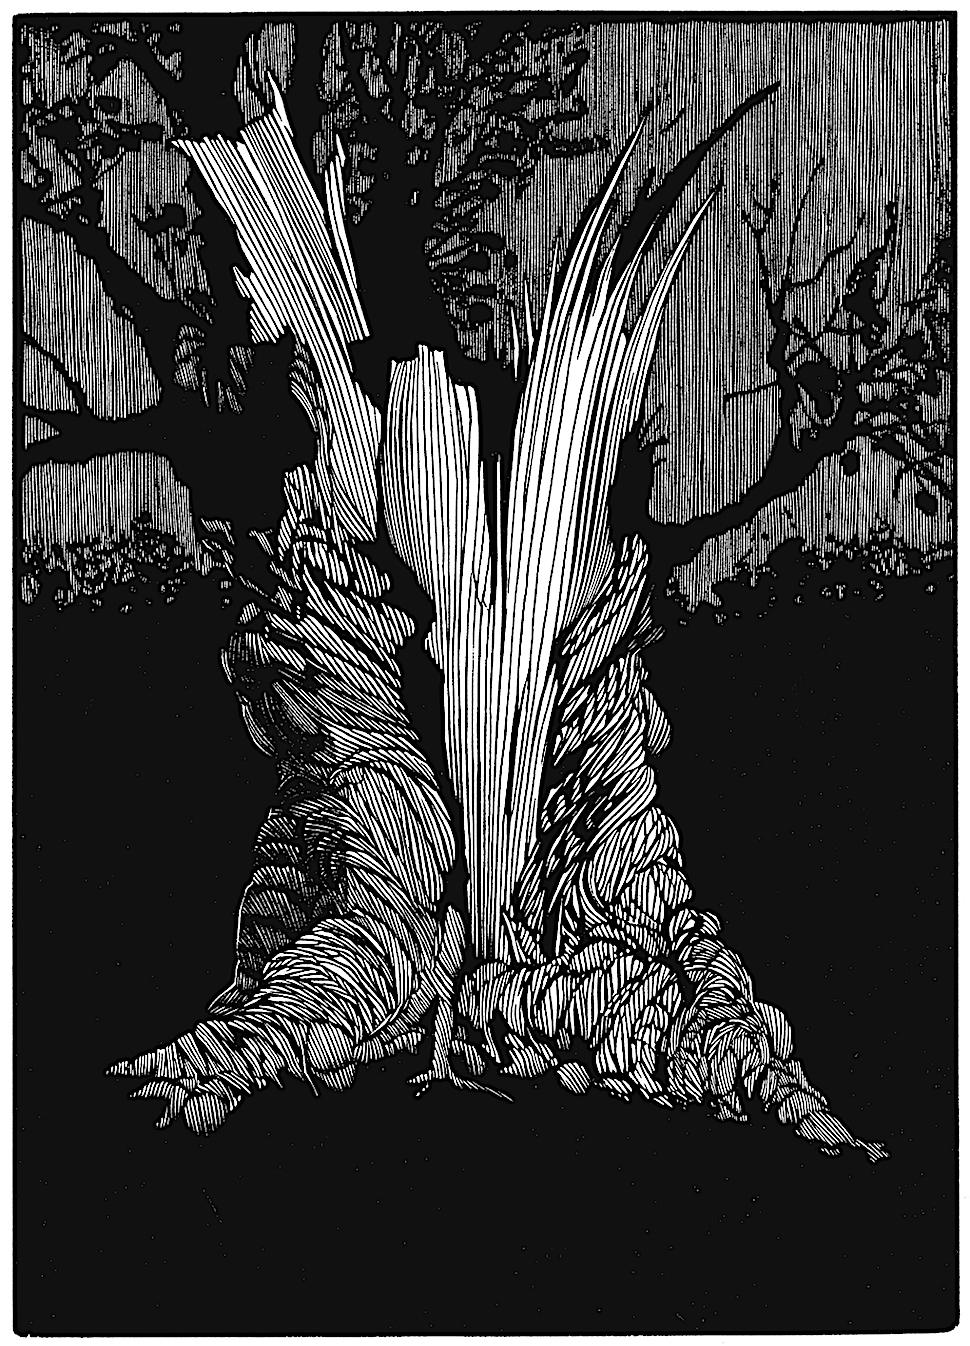 a Barry Moser illustration of a violently damaged tree